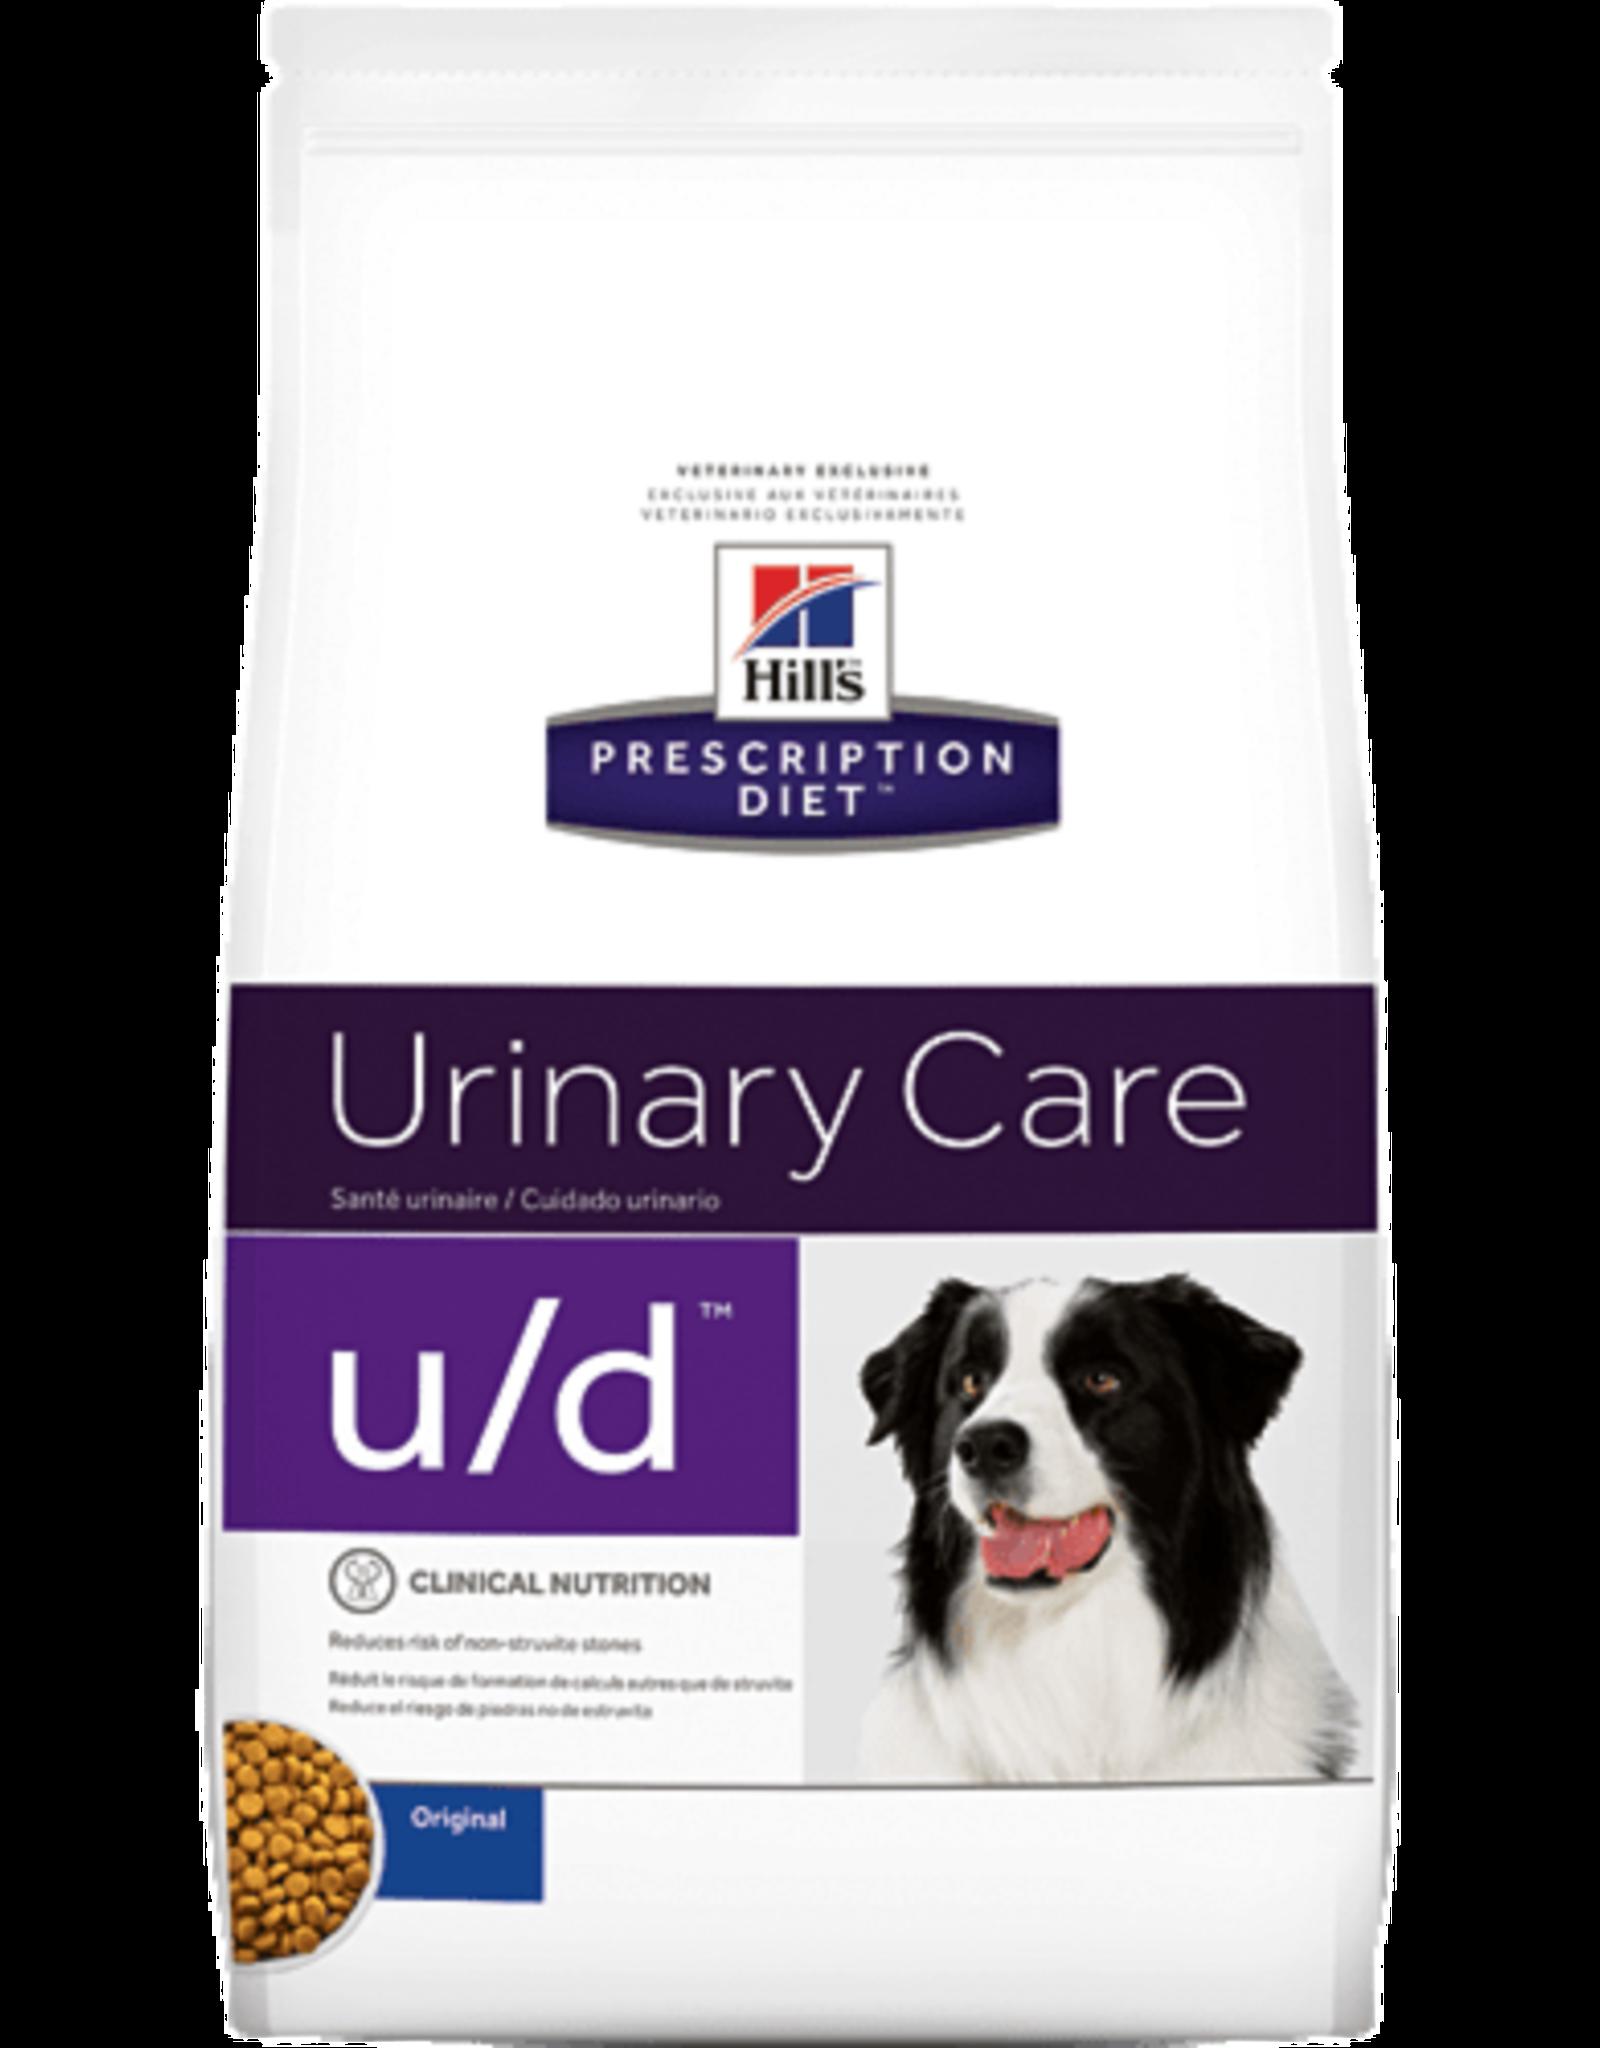 Hill's Hill's Prescription Diet U/d Dog 12kg